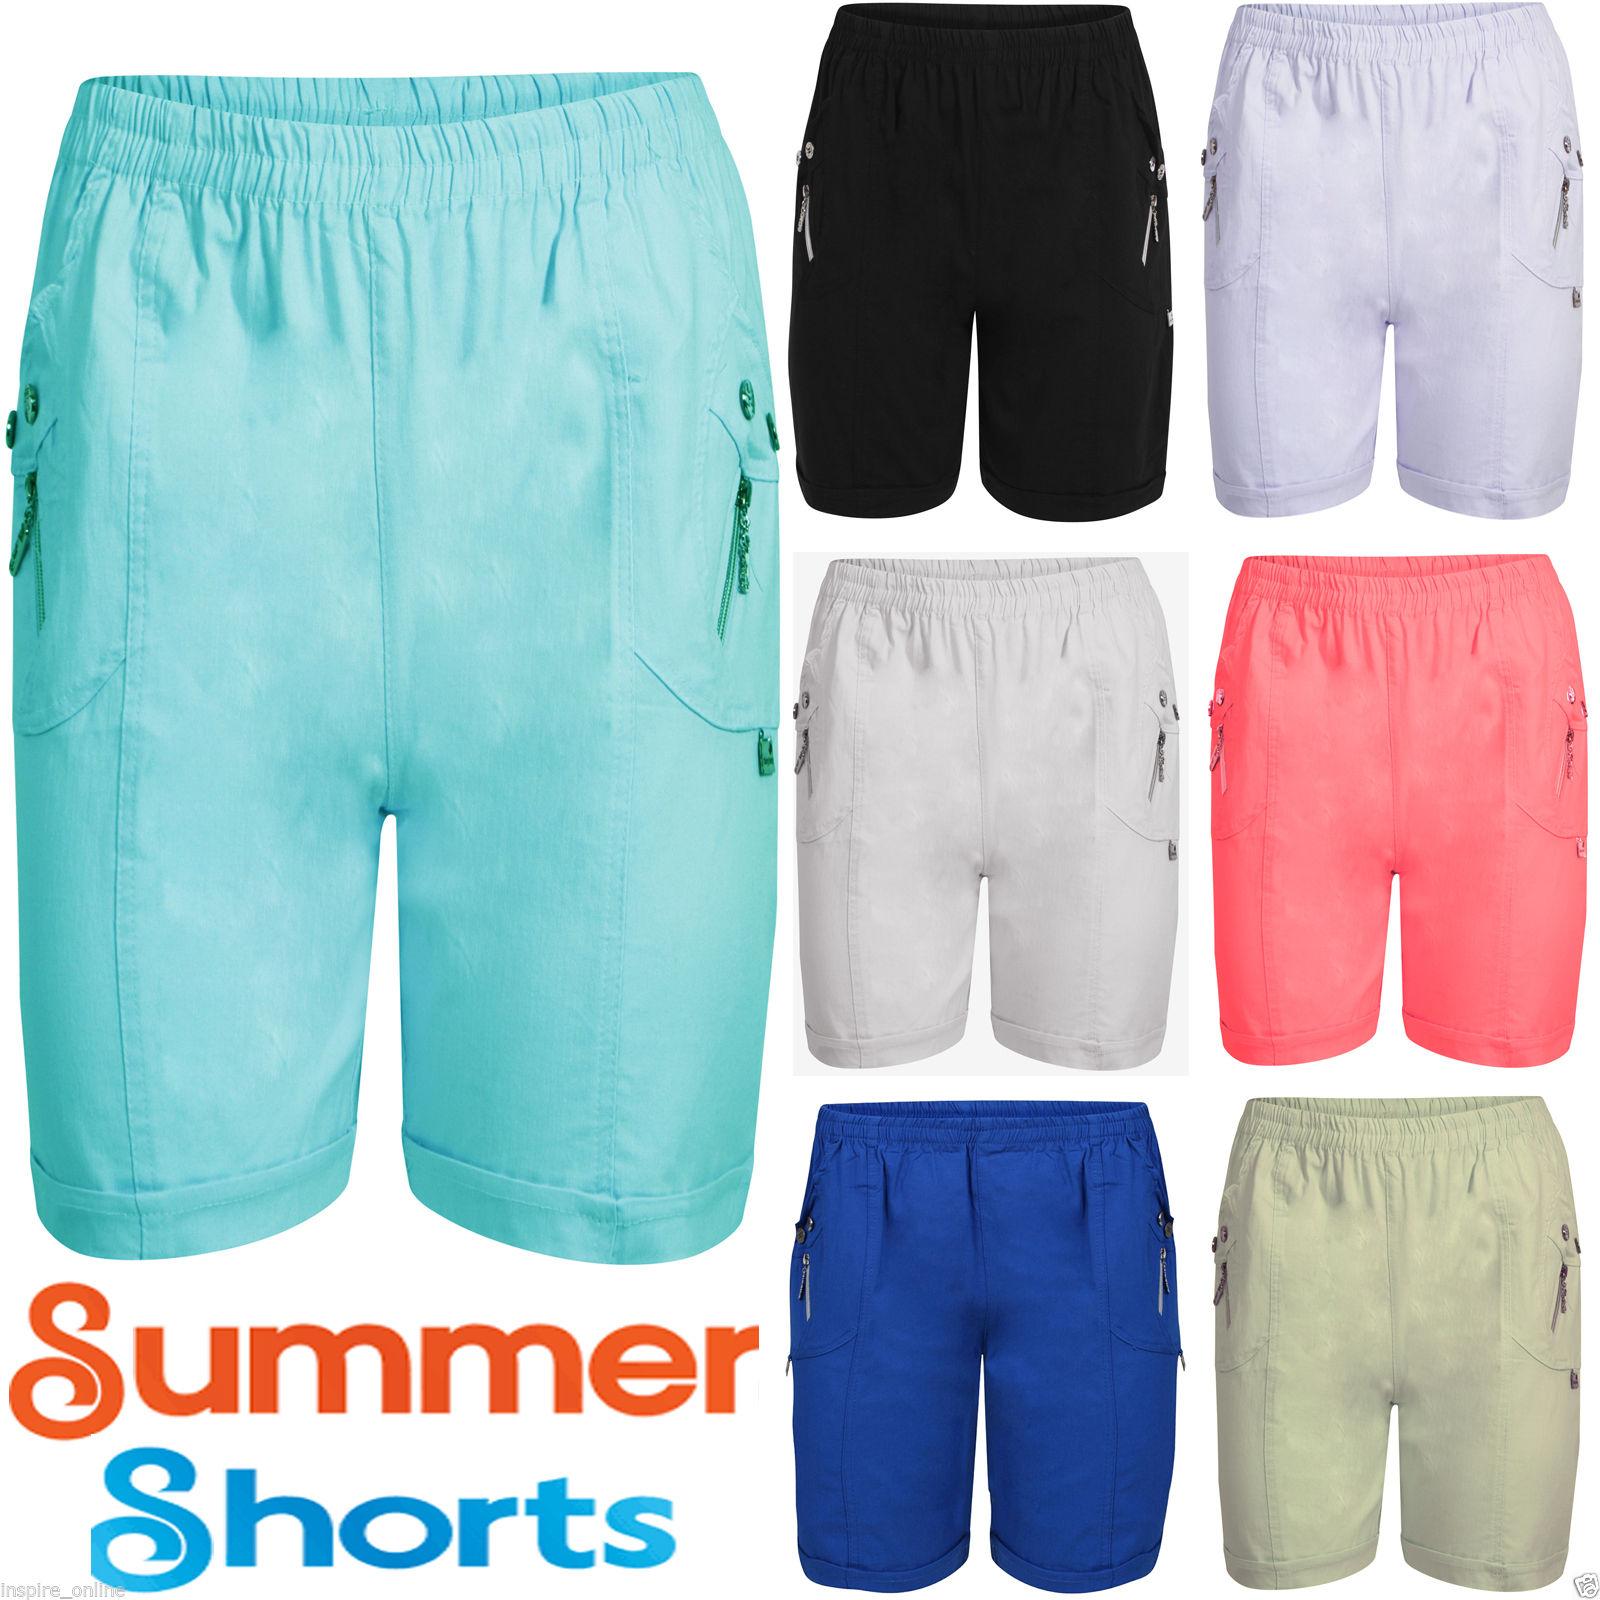 NEW LADIES WOMENS STRETCHY GIRLS ELASTICATED WAIST SUMMER BEACH SHORTS HOT PANTS